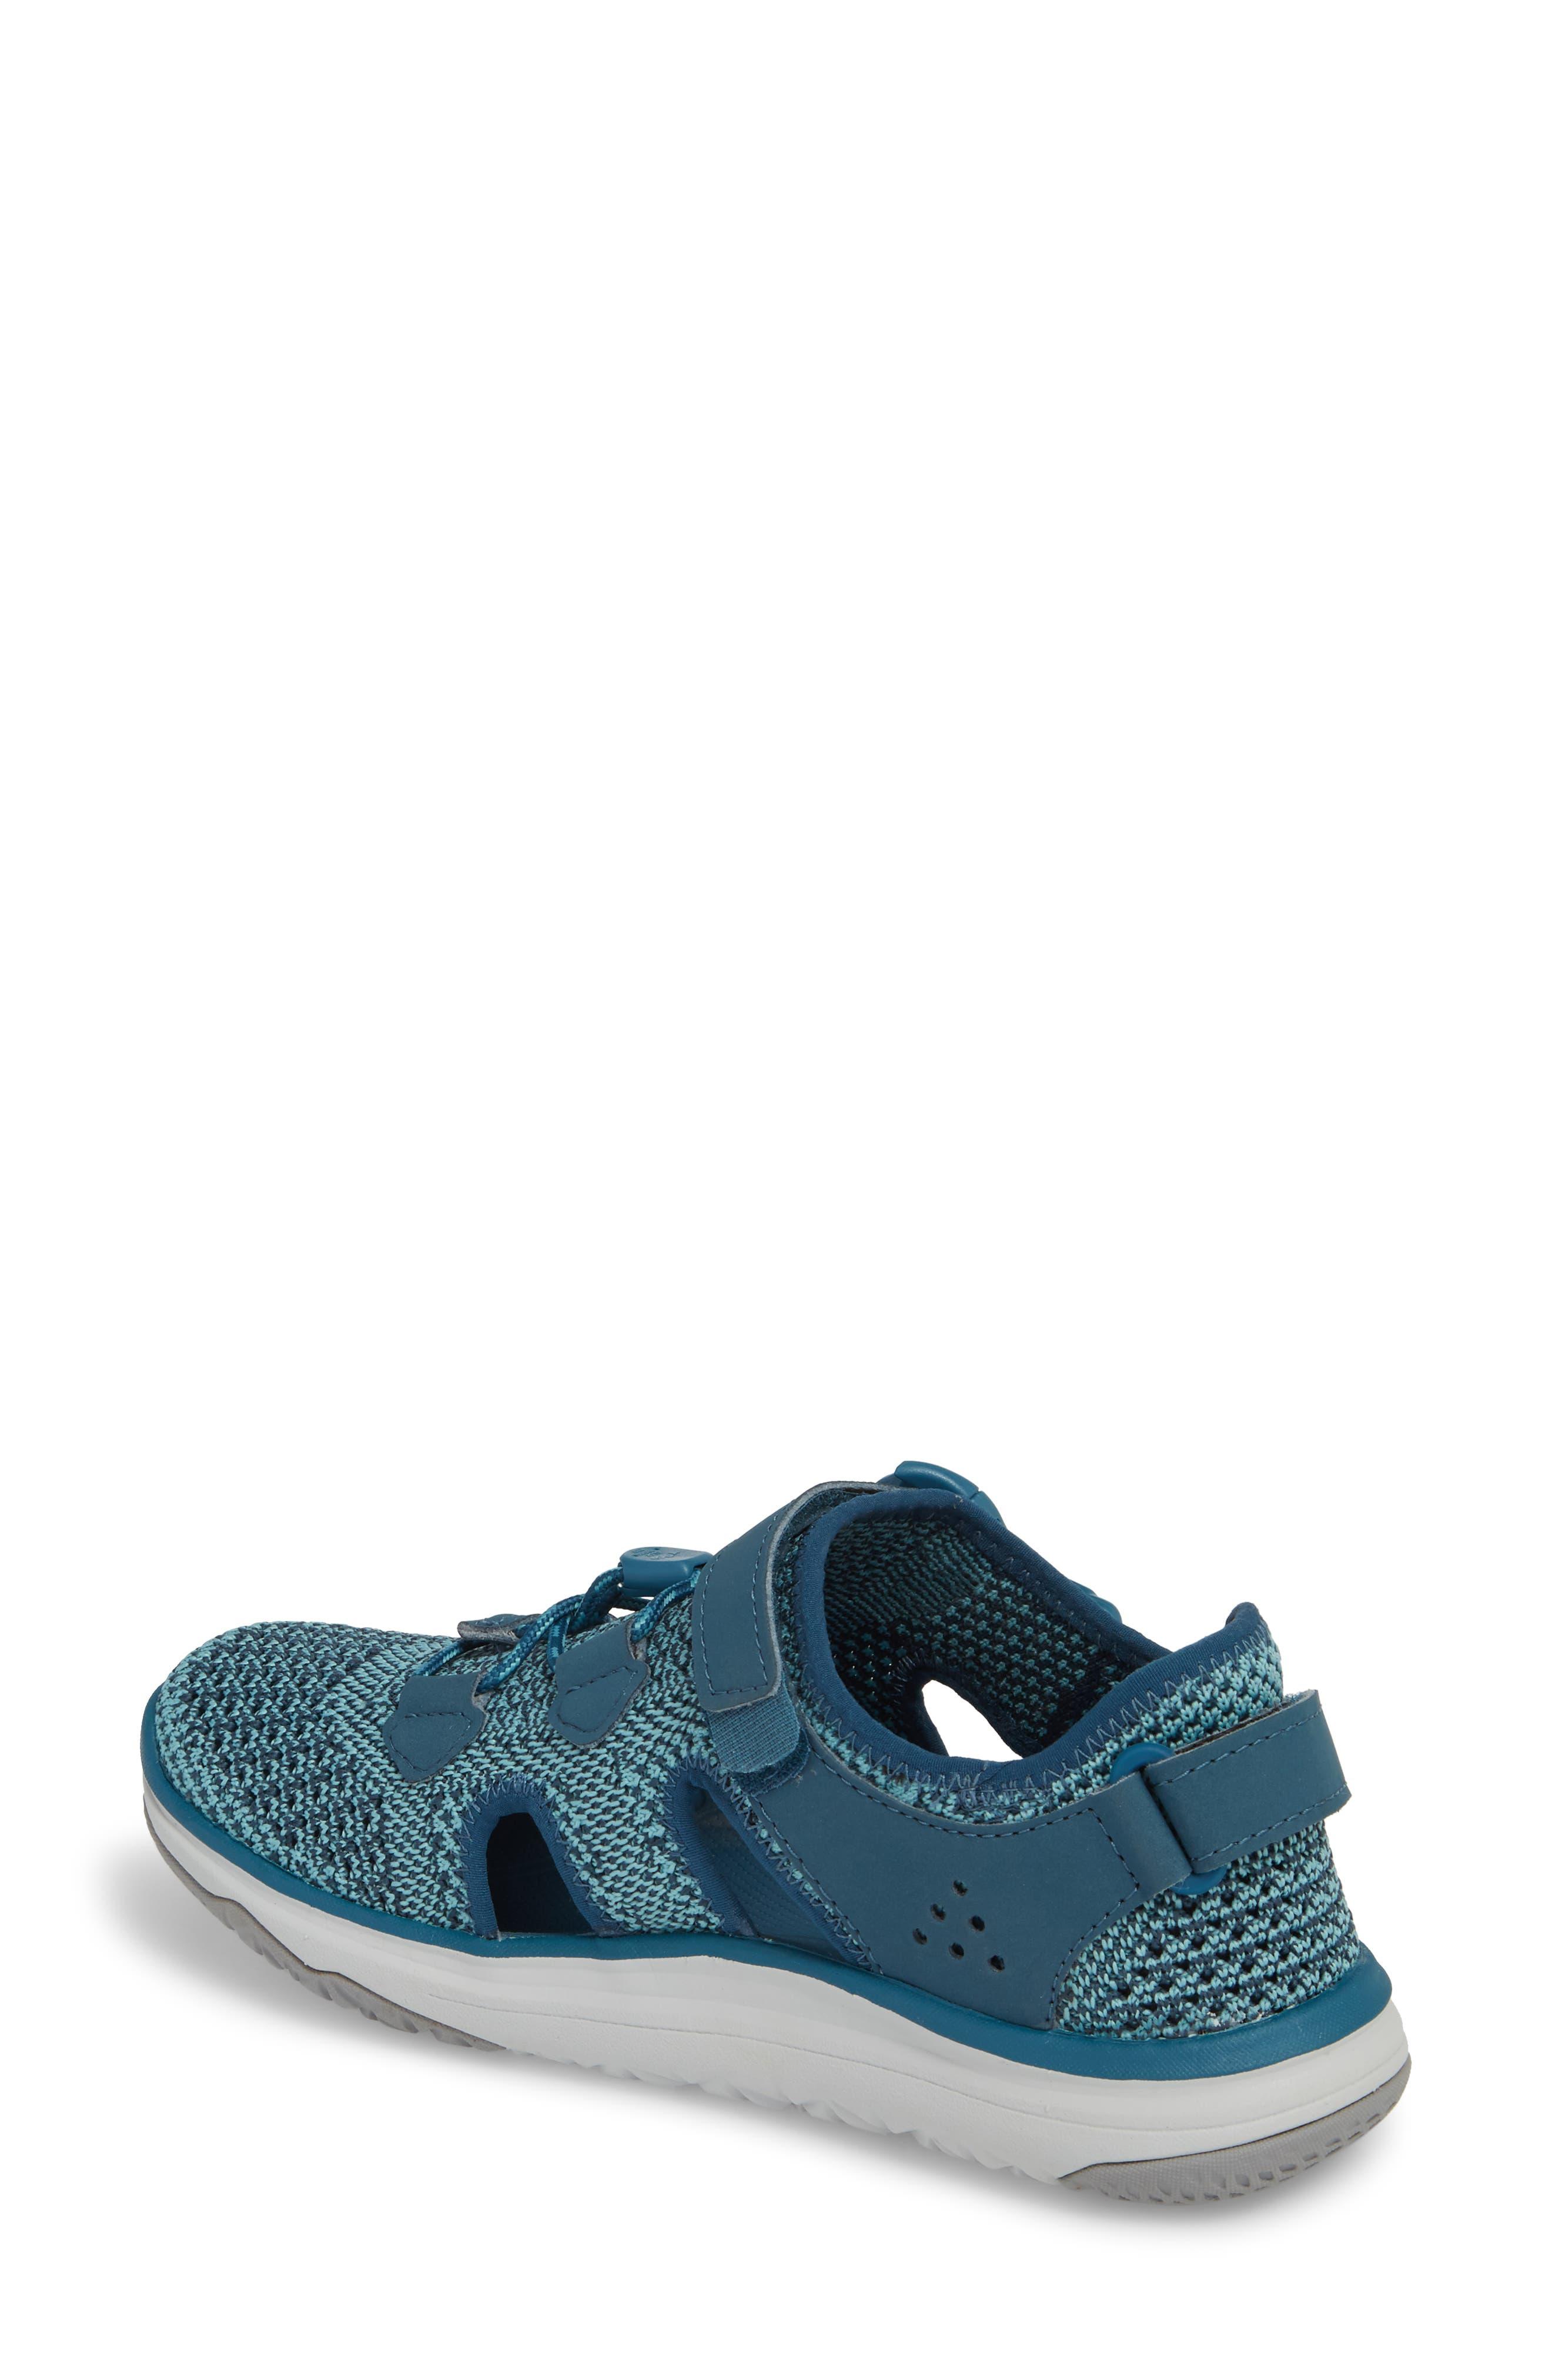 Terra Float Travel Knit Active Sandal,                             Alternate thumbnail 2, color,                             LEGION BLUE